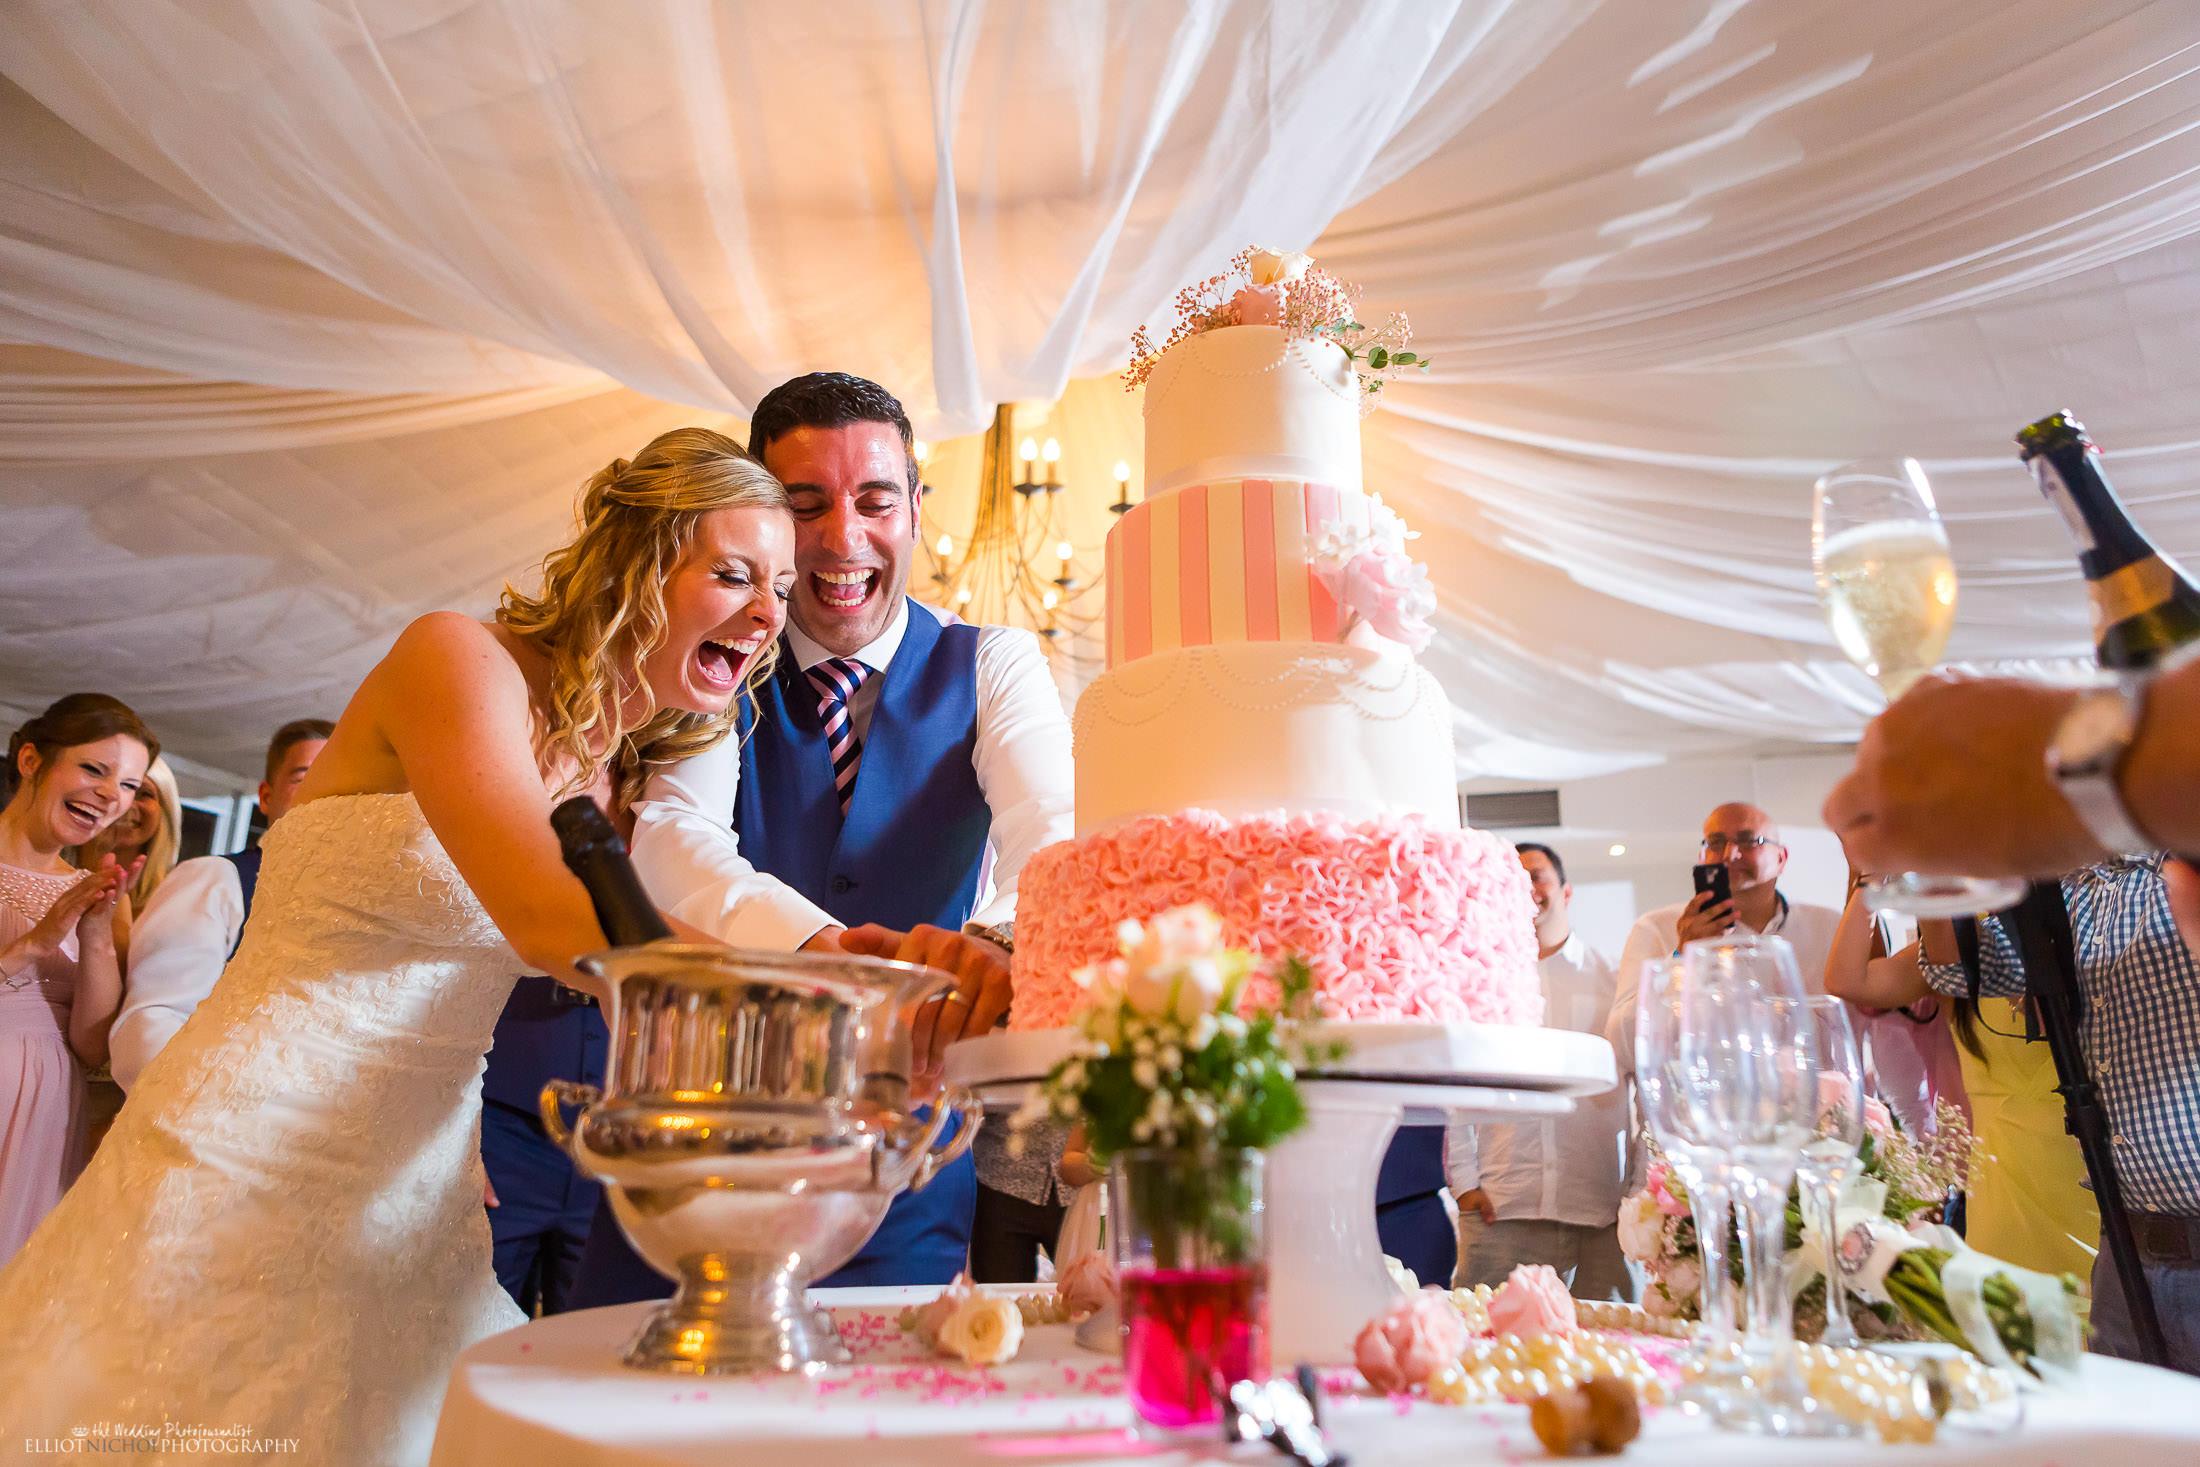 Couple have fun cutting their wedding cake. Photo by North East UK wedding photographer Elliot Nichol Photography.